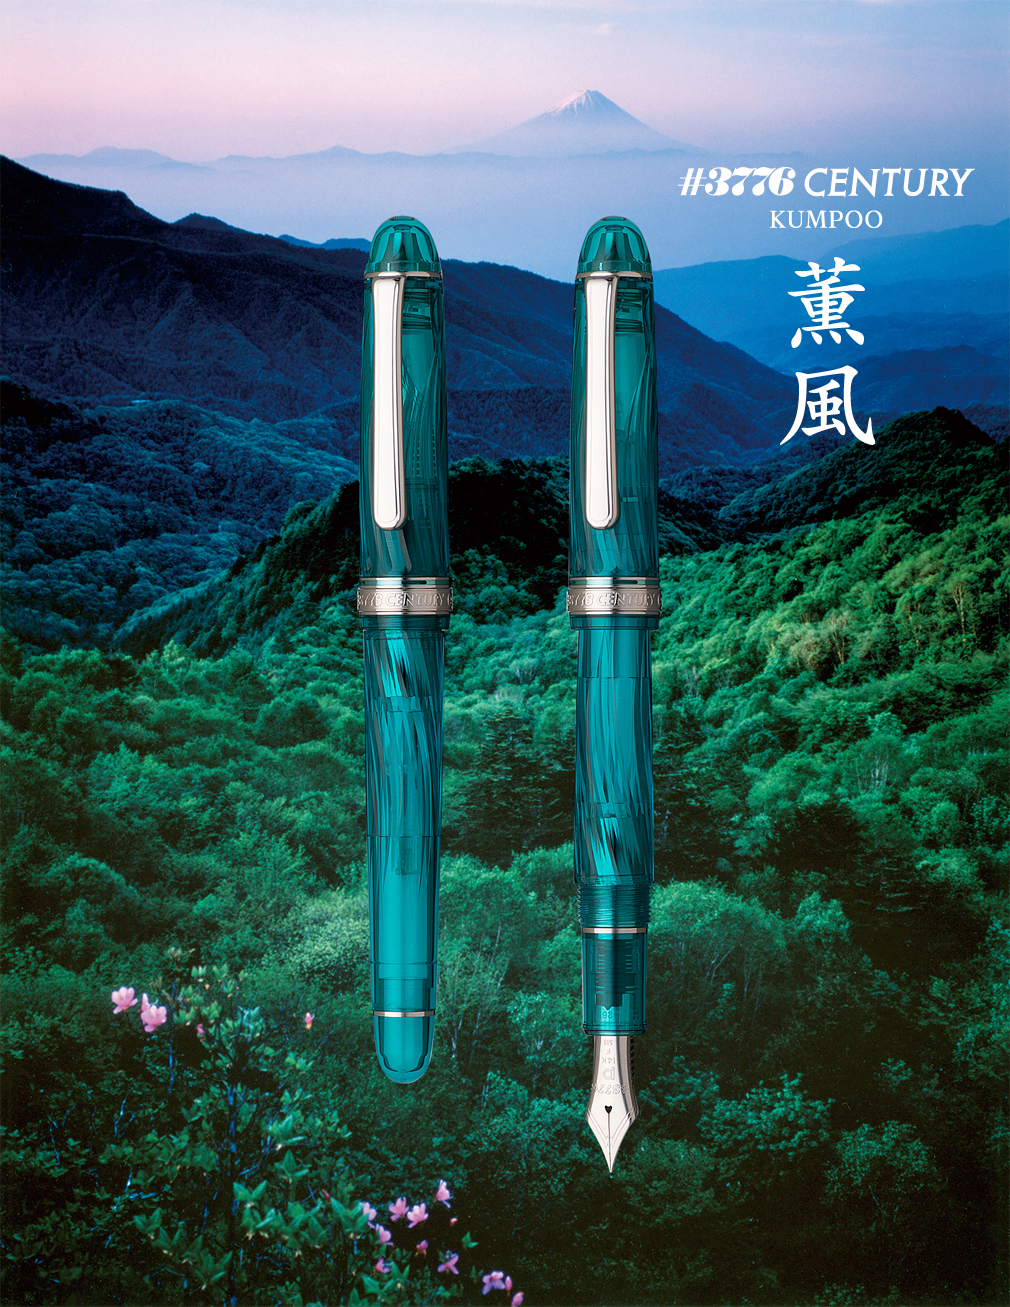 Platinum 3776 Kumpoo Fountain Pen